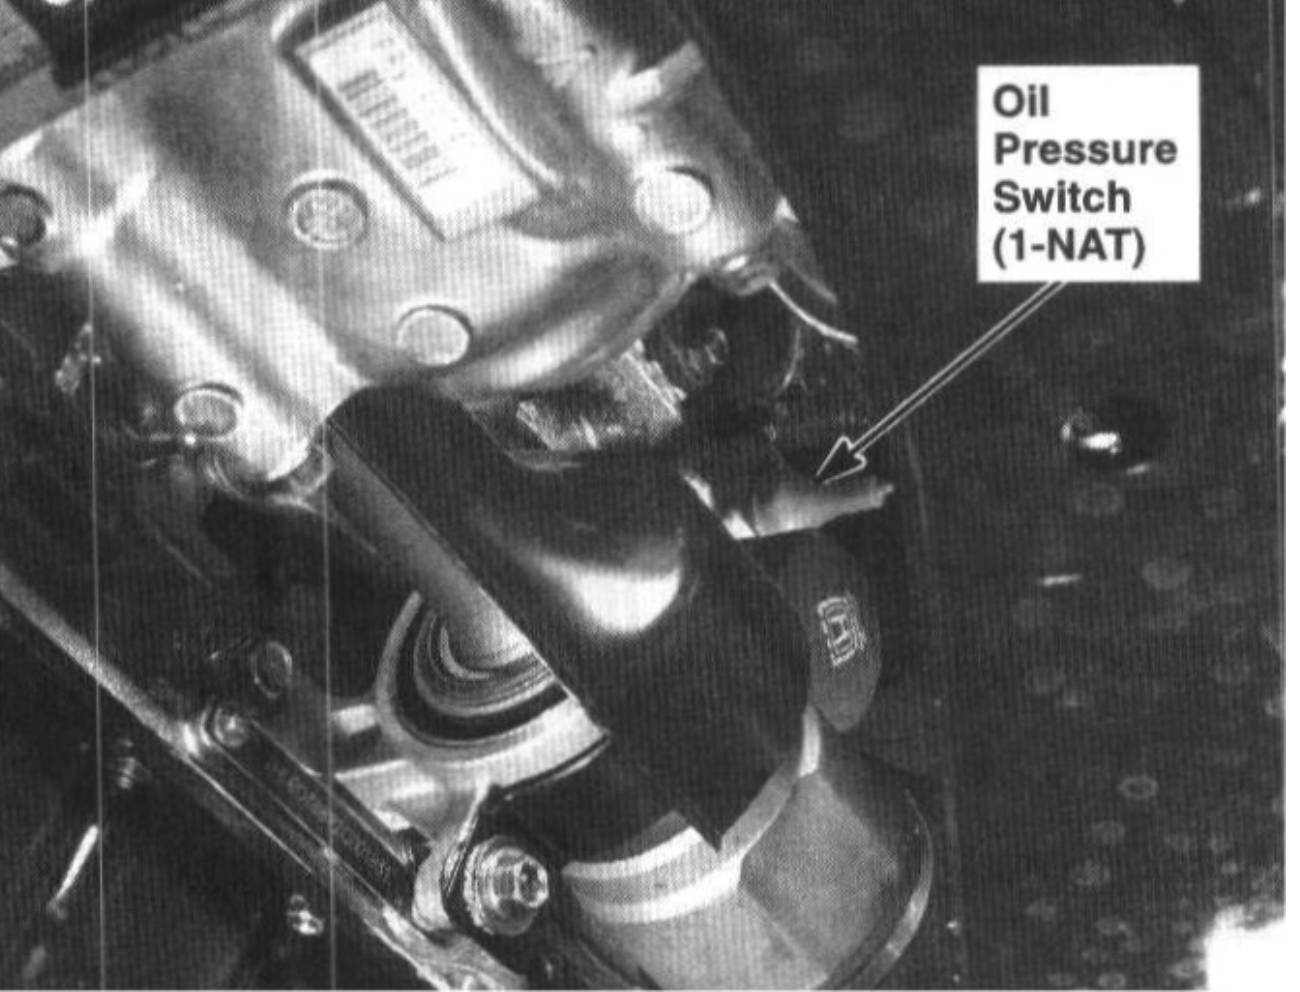 I have a 2004 Honda CRV that throws a 1259 code (Vtec error) and